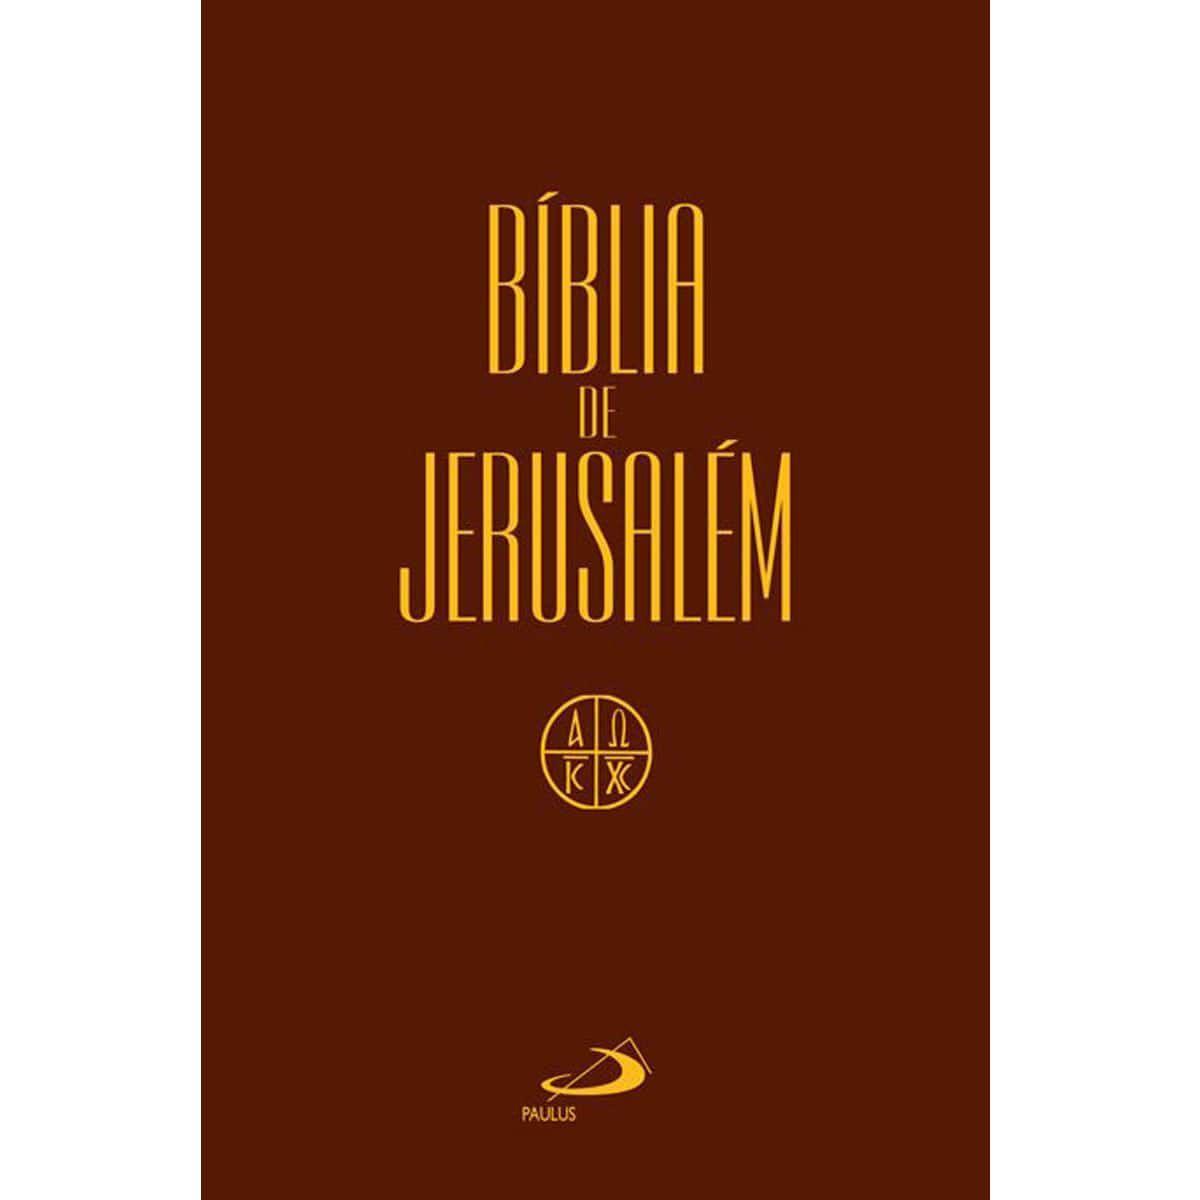 Bíblia de Jerusalém Média Cristal Paulus  - Livraria Betel